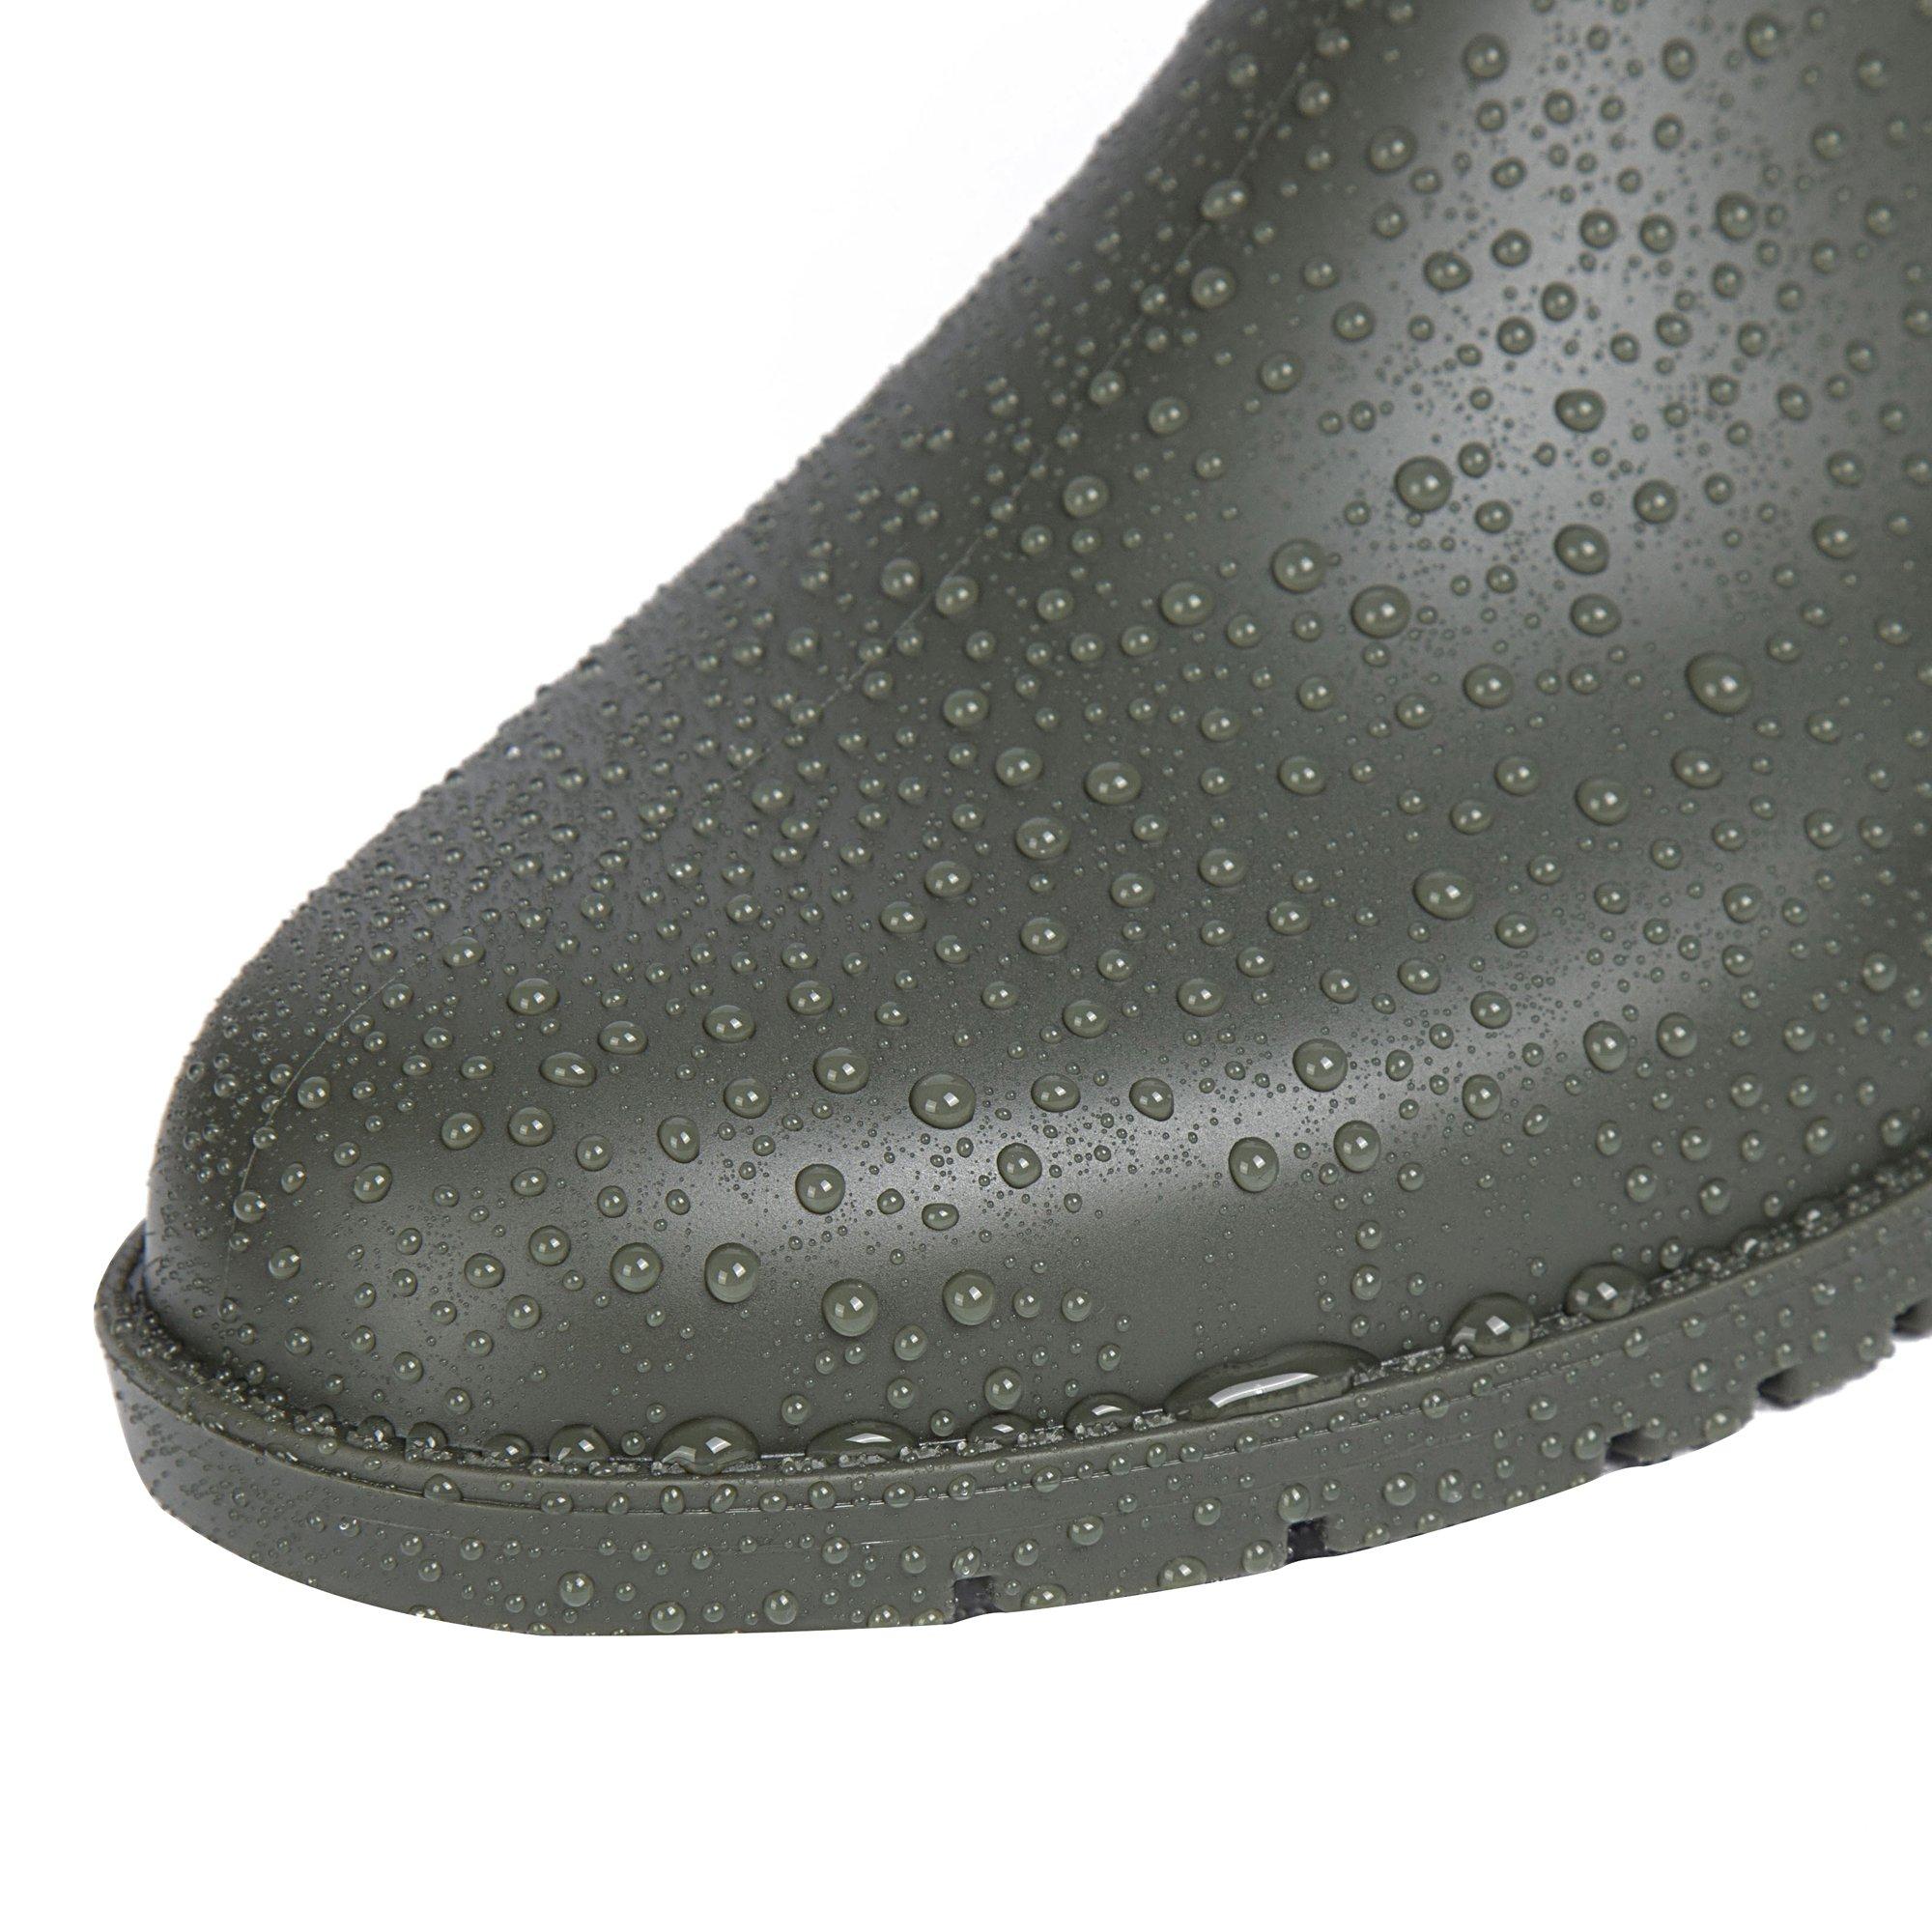 Asgard Girl's Waterproof Chelsea Rain Boots Short Ankel Snow Boots for Kids CA34 by Asgard (Image #3)